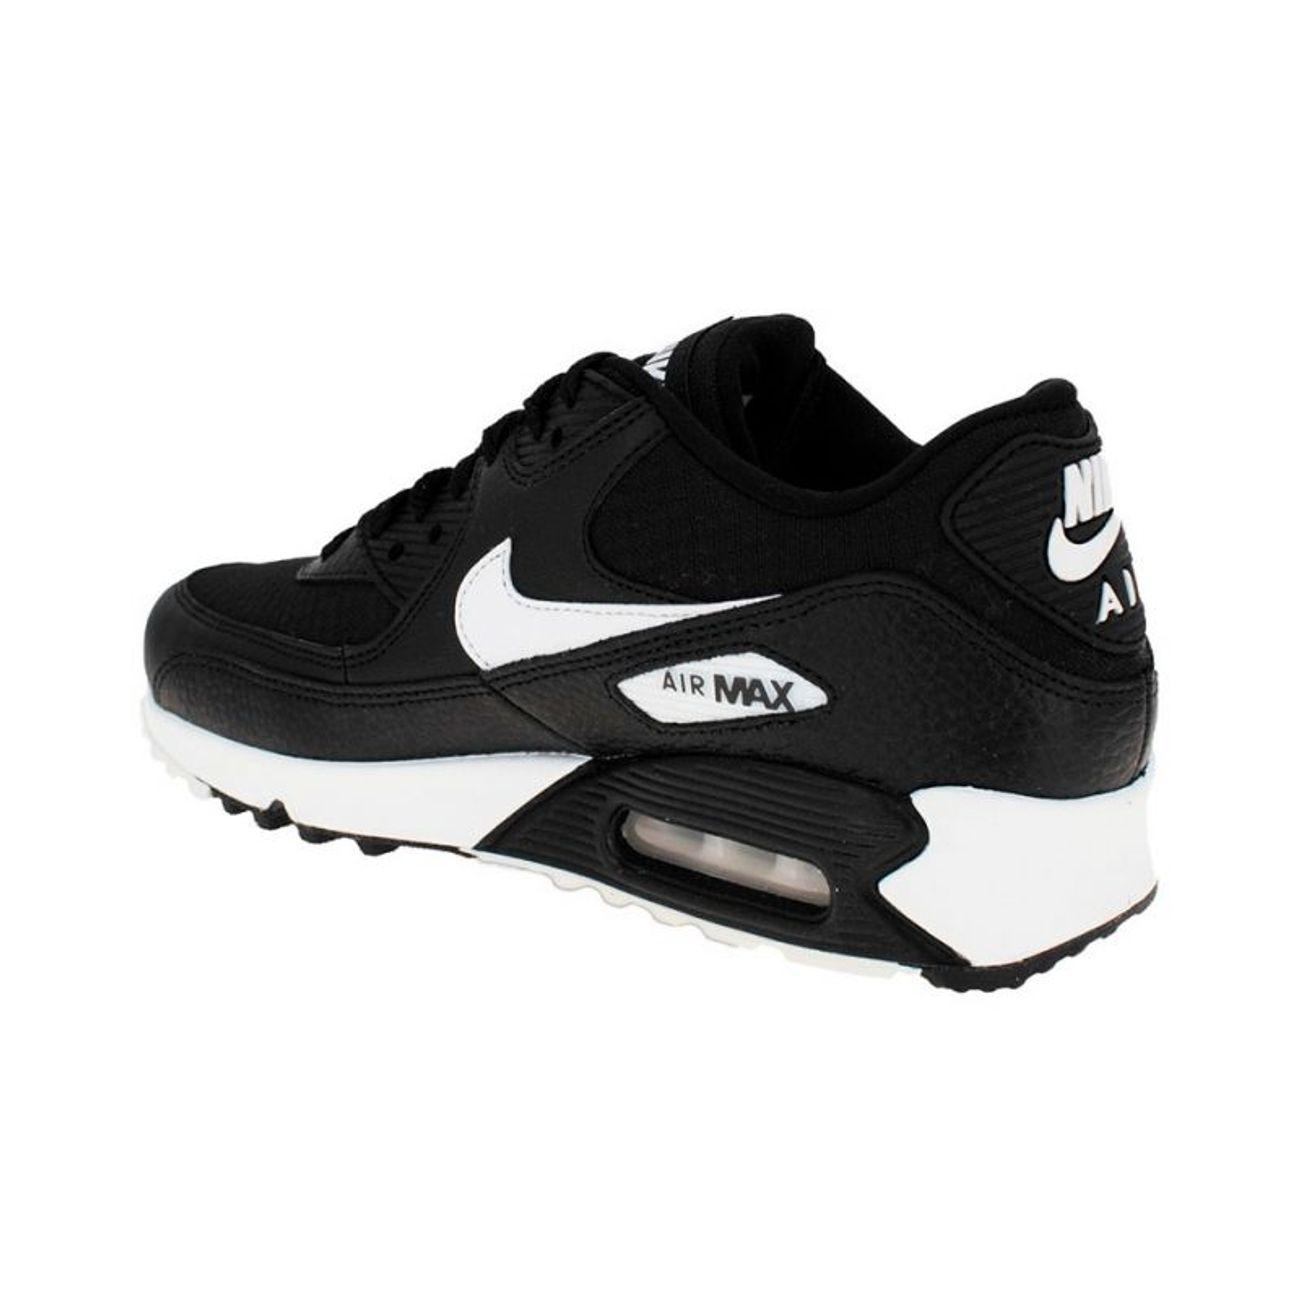 Air Adulte 90 Noir Femme Nike Max Padel 8nP0wkNOXZ